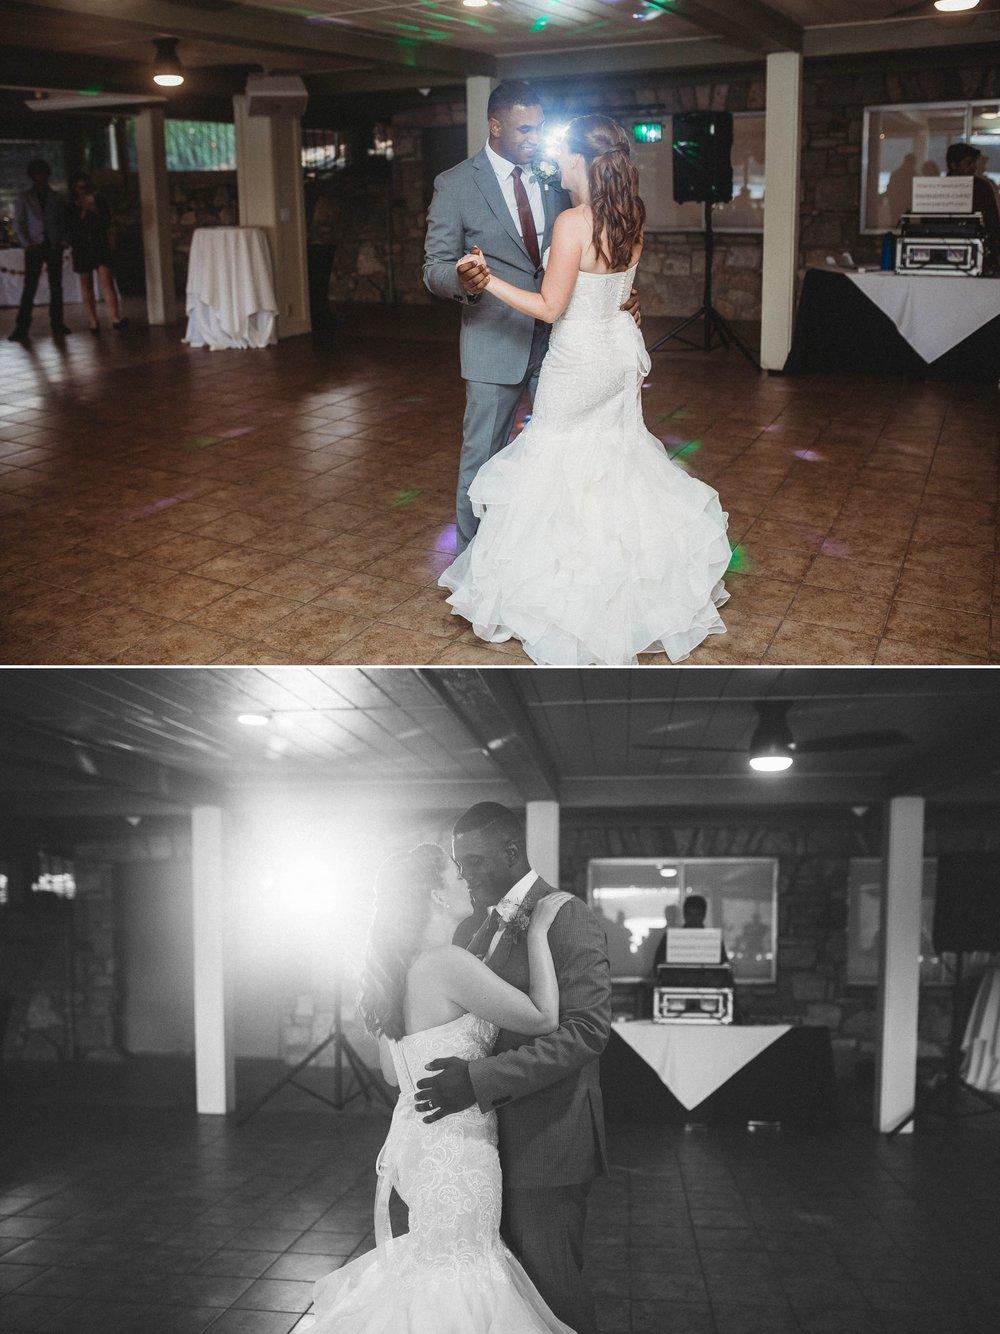 Reception - Rachel + Jamison - Rumbling Bald Resort, Lake Lure, NC - Asheville, North Carolina Wedding Photographer